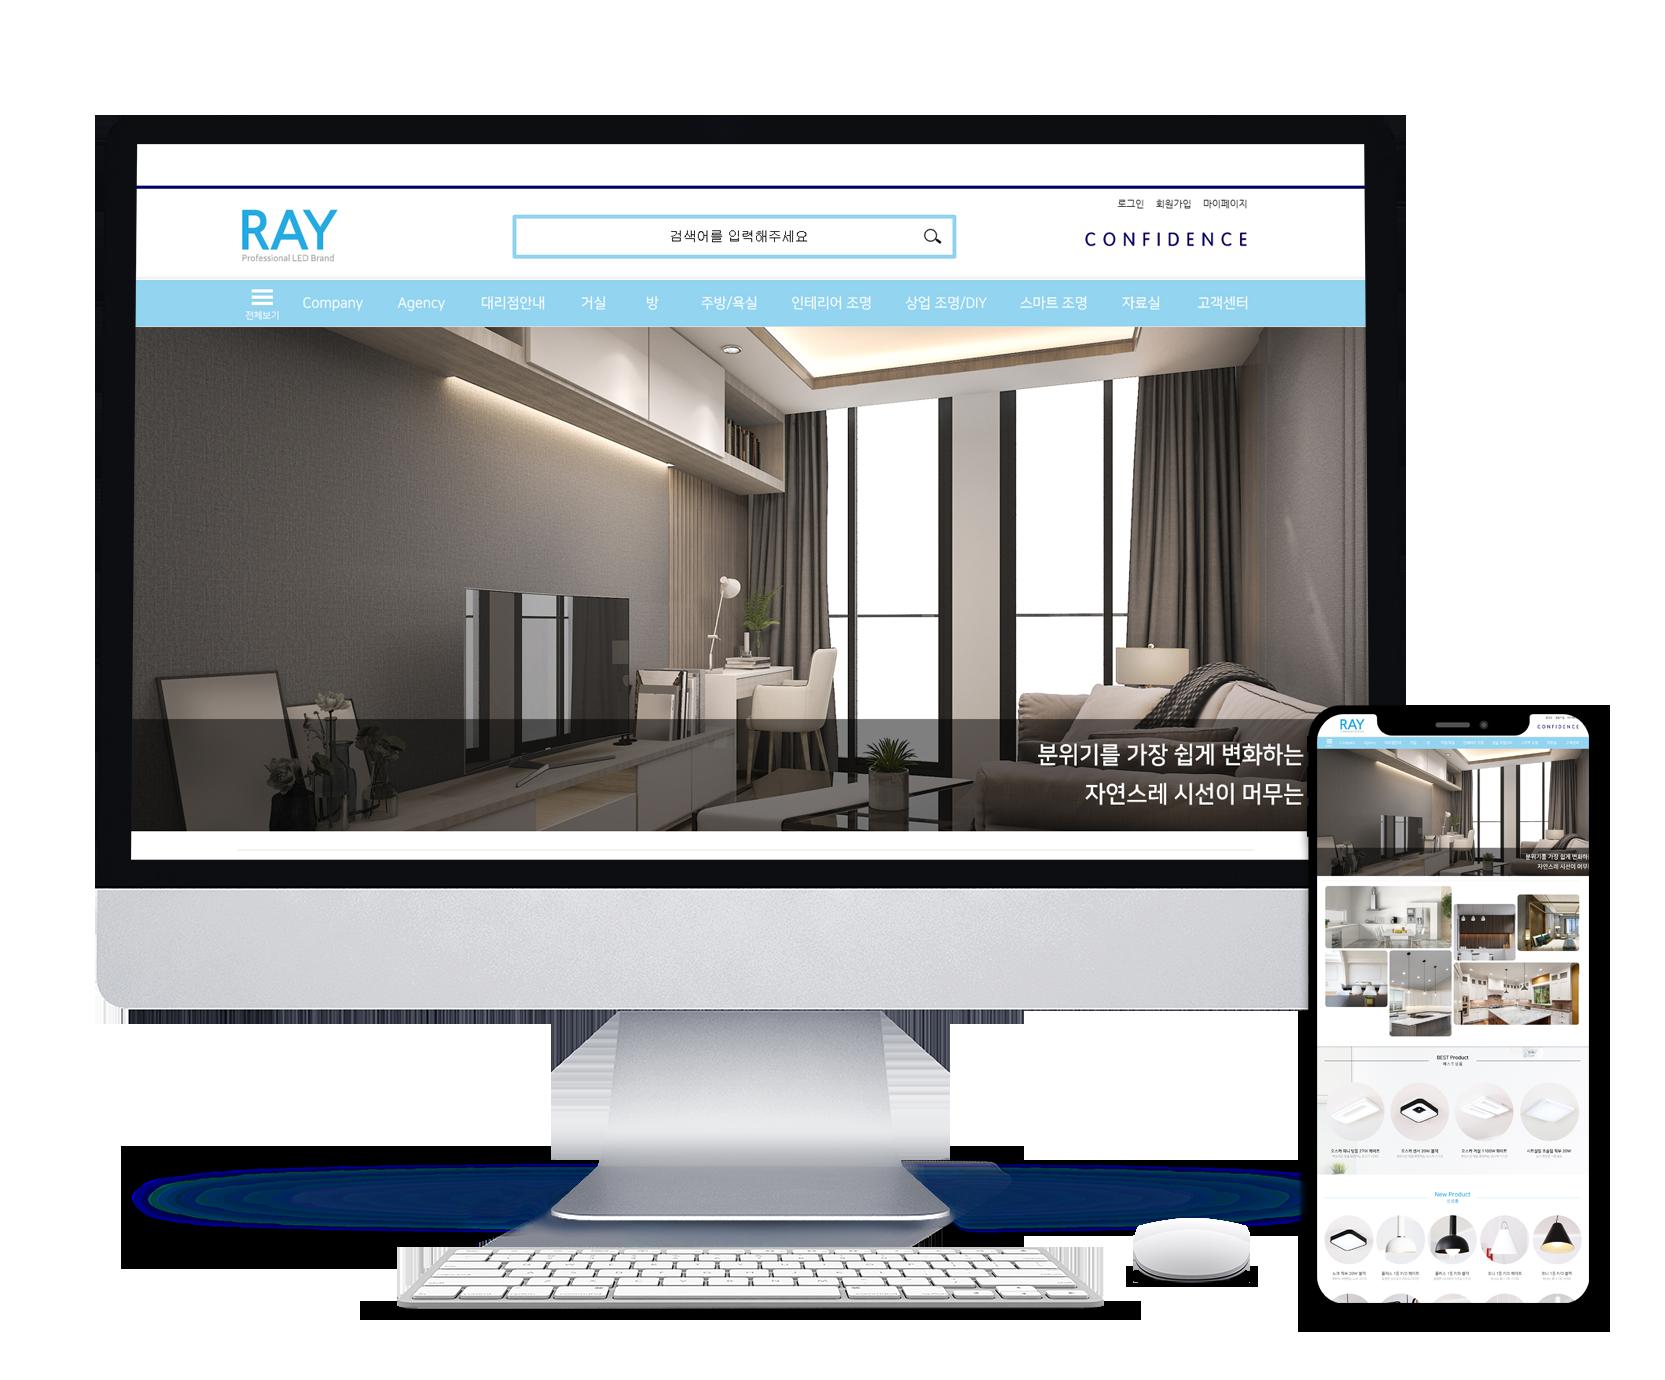 Ray LED Shop